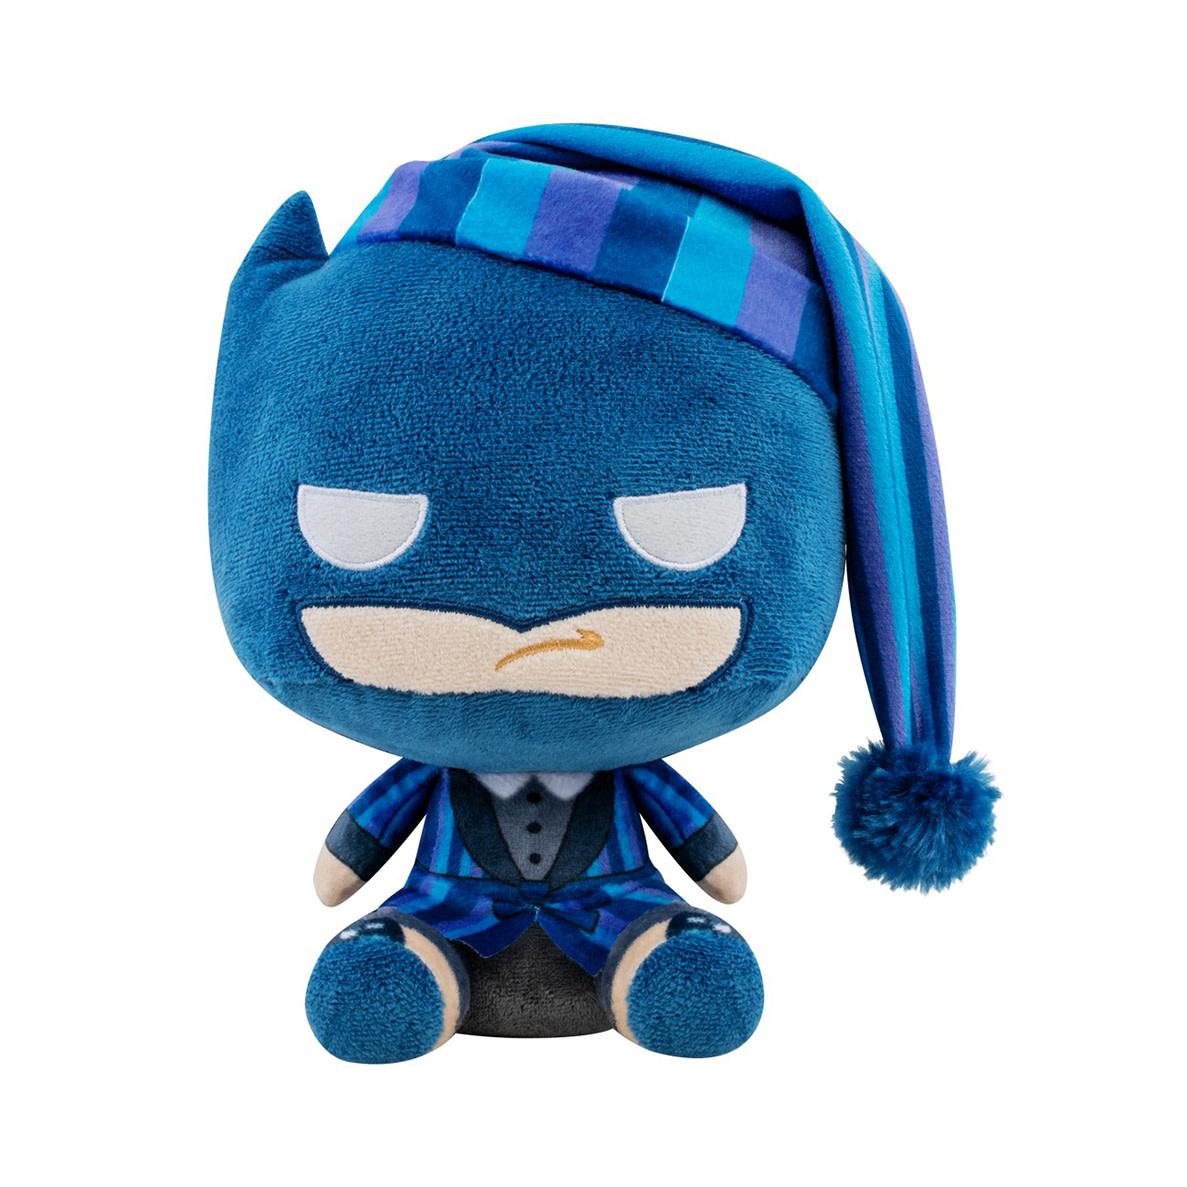 FUNKO Pop! Plush: DC Holiday - Scrooge Batman 7 inch Plush